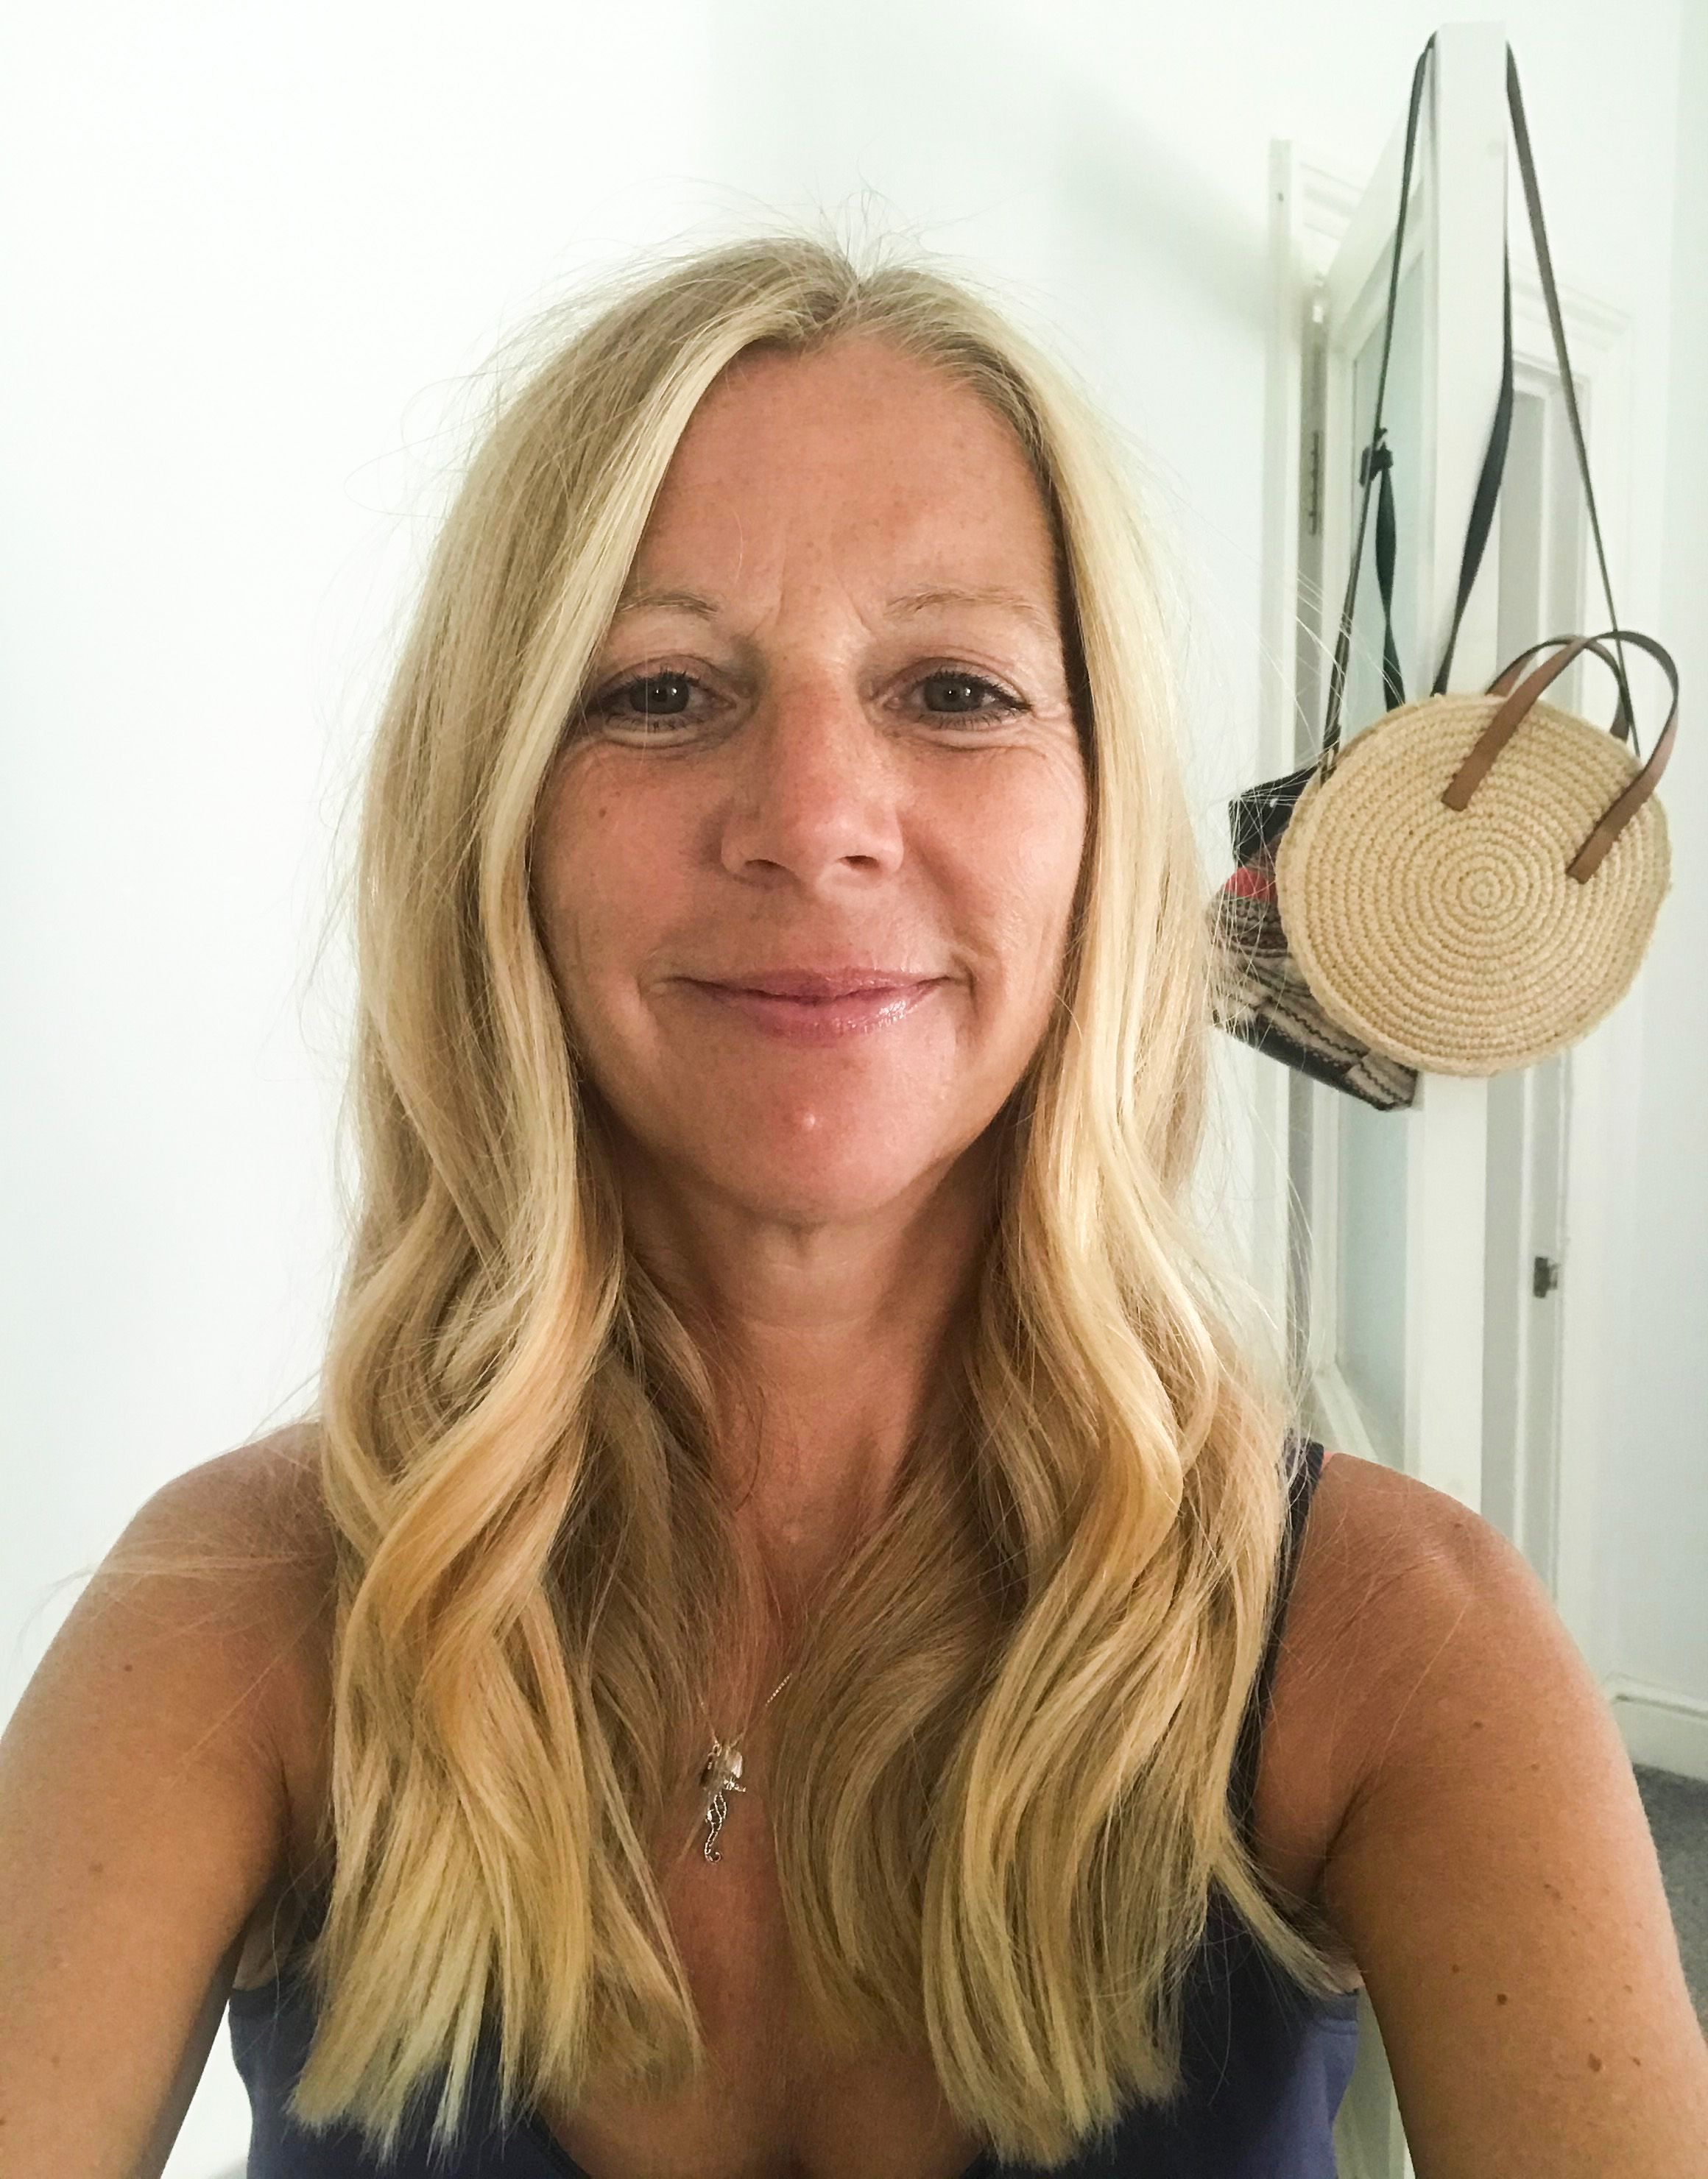 Cathy Proctor